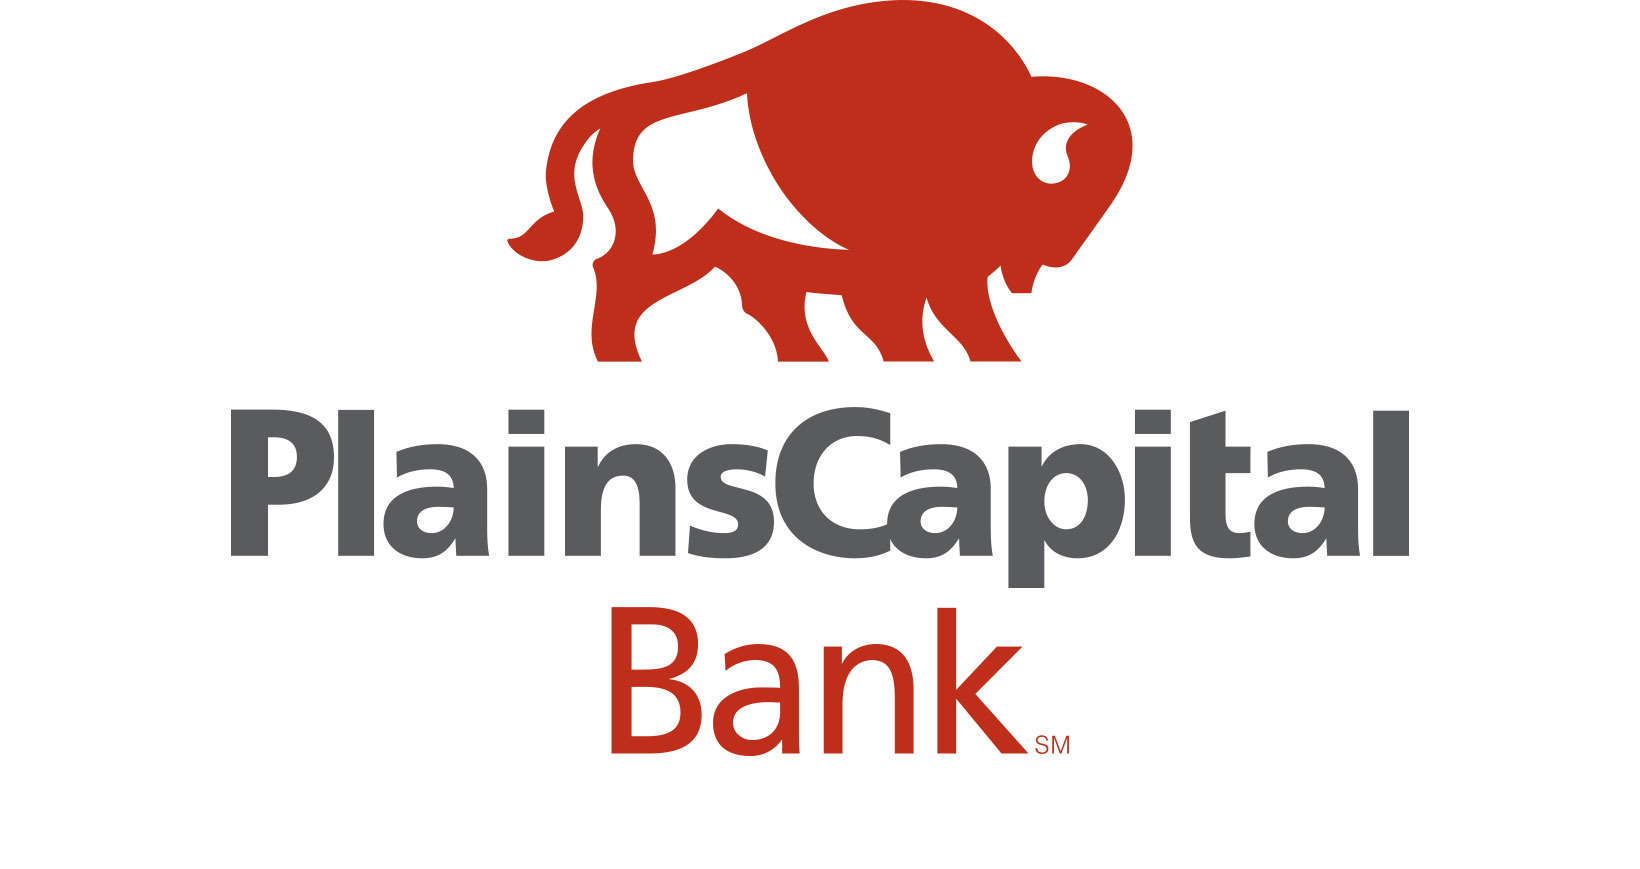 PlainsCapital Bank logo